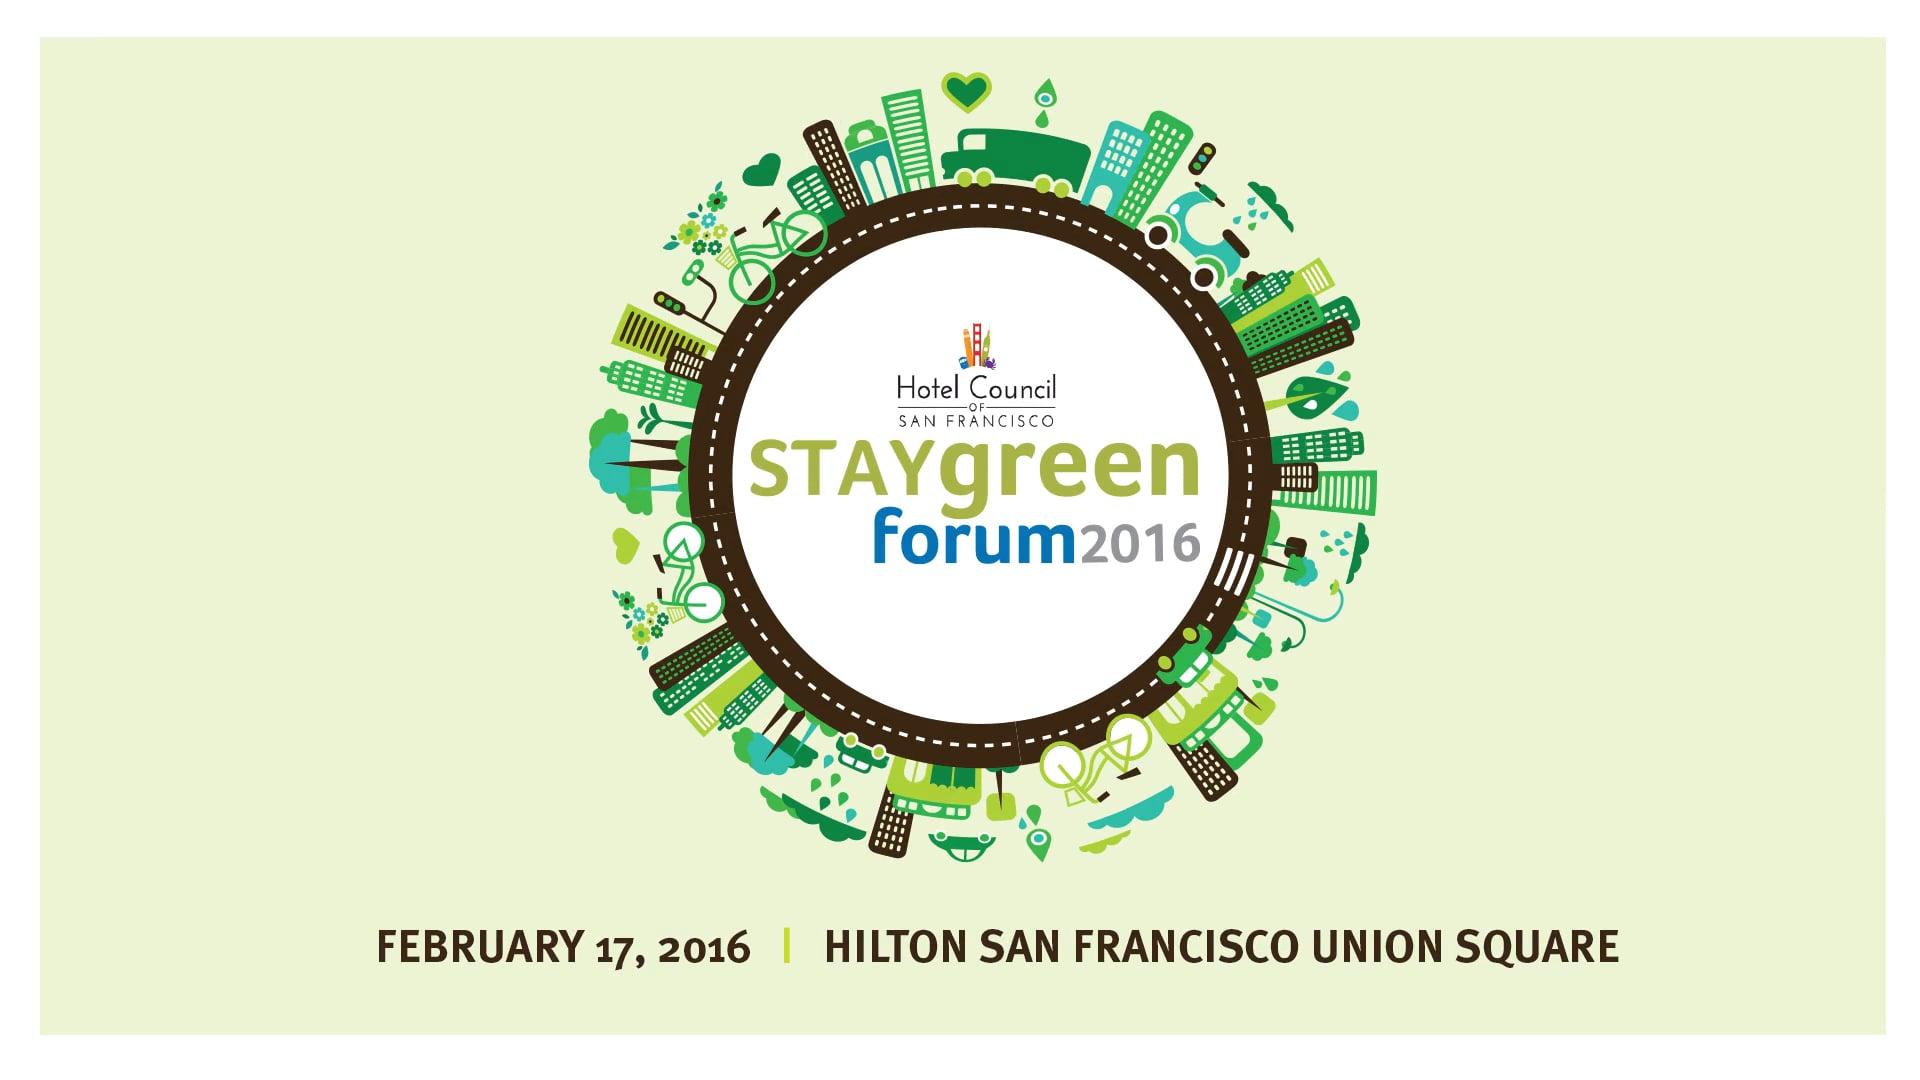 Stay Green 2016 Forum